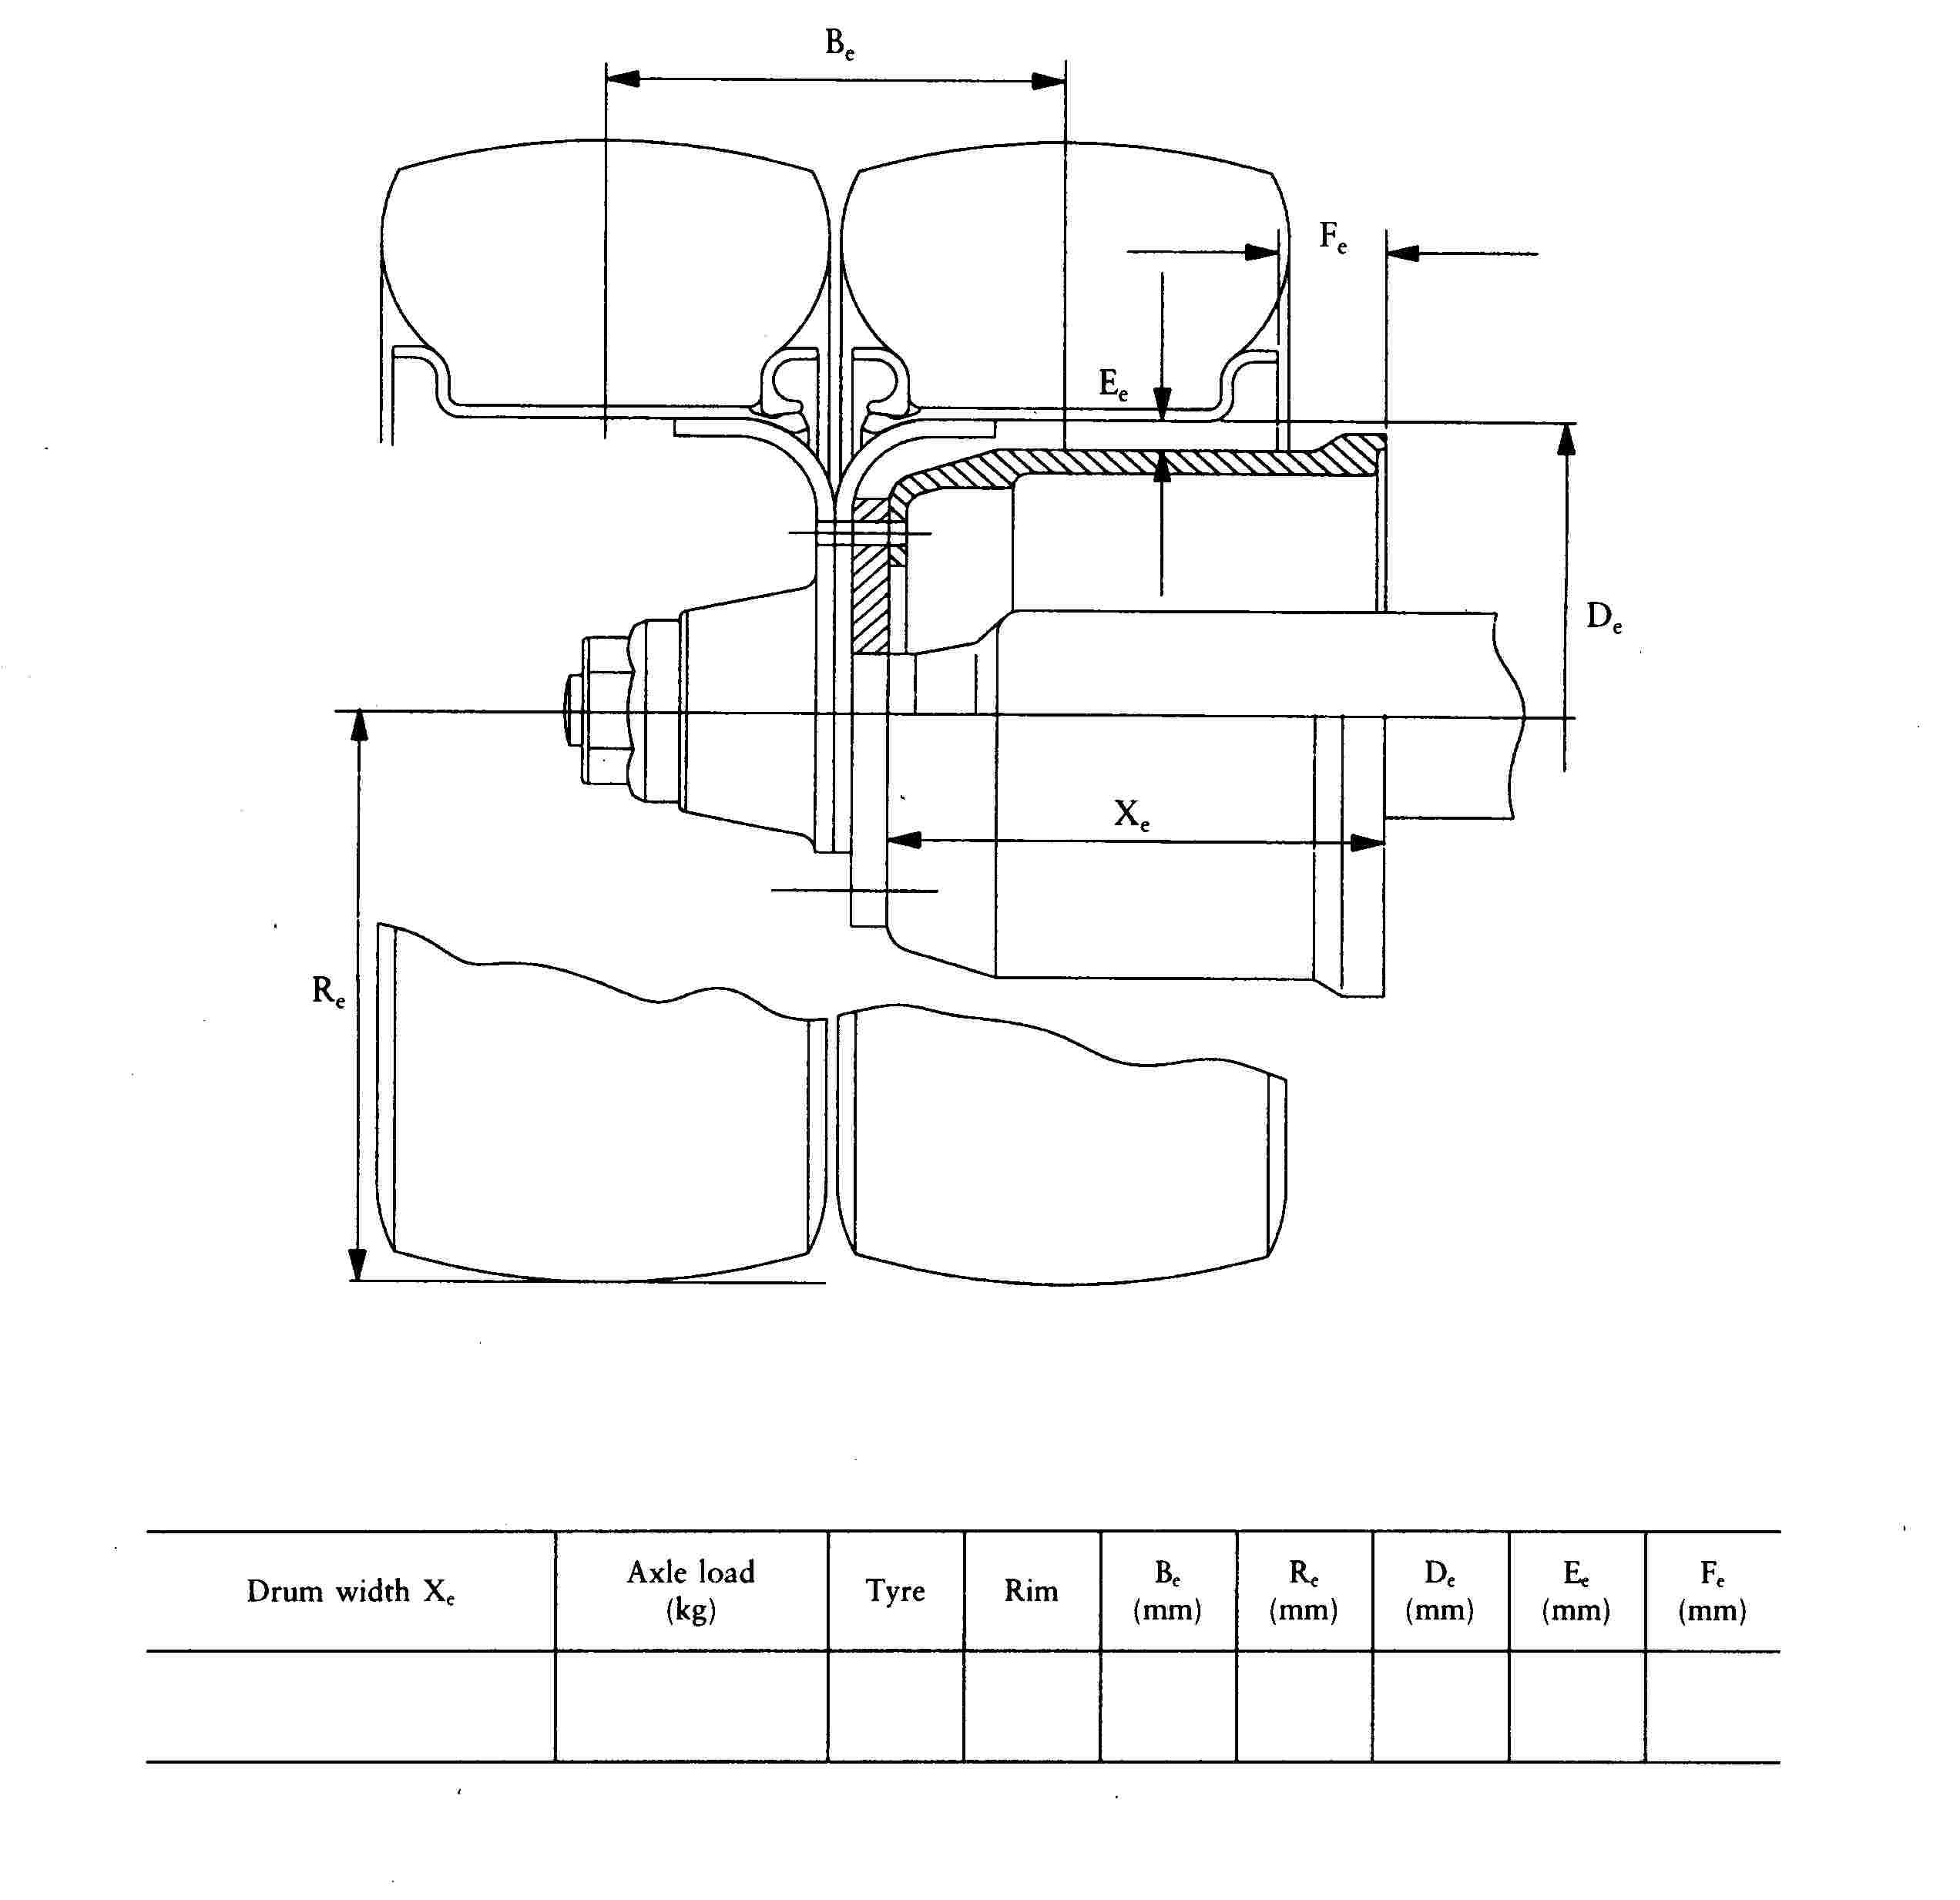 Eur Lex 01971l0320 20070101 En Economy Tractor Restoration Power King Wiring Diagram Factory Image